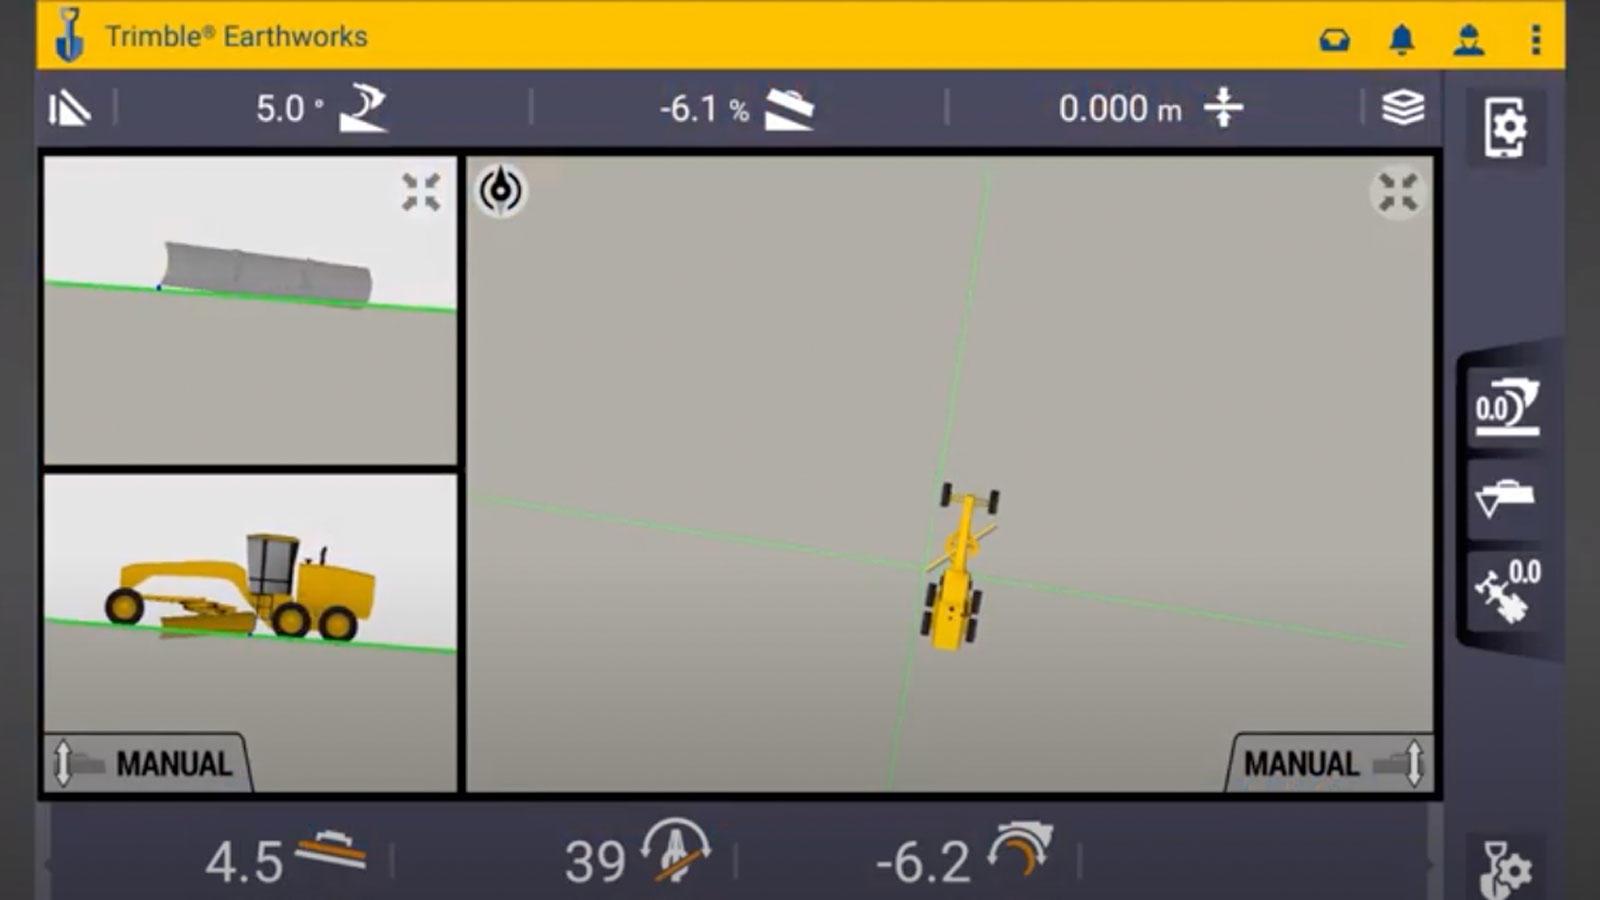 trimble earthworks software for motor graders